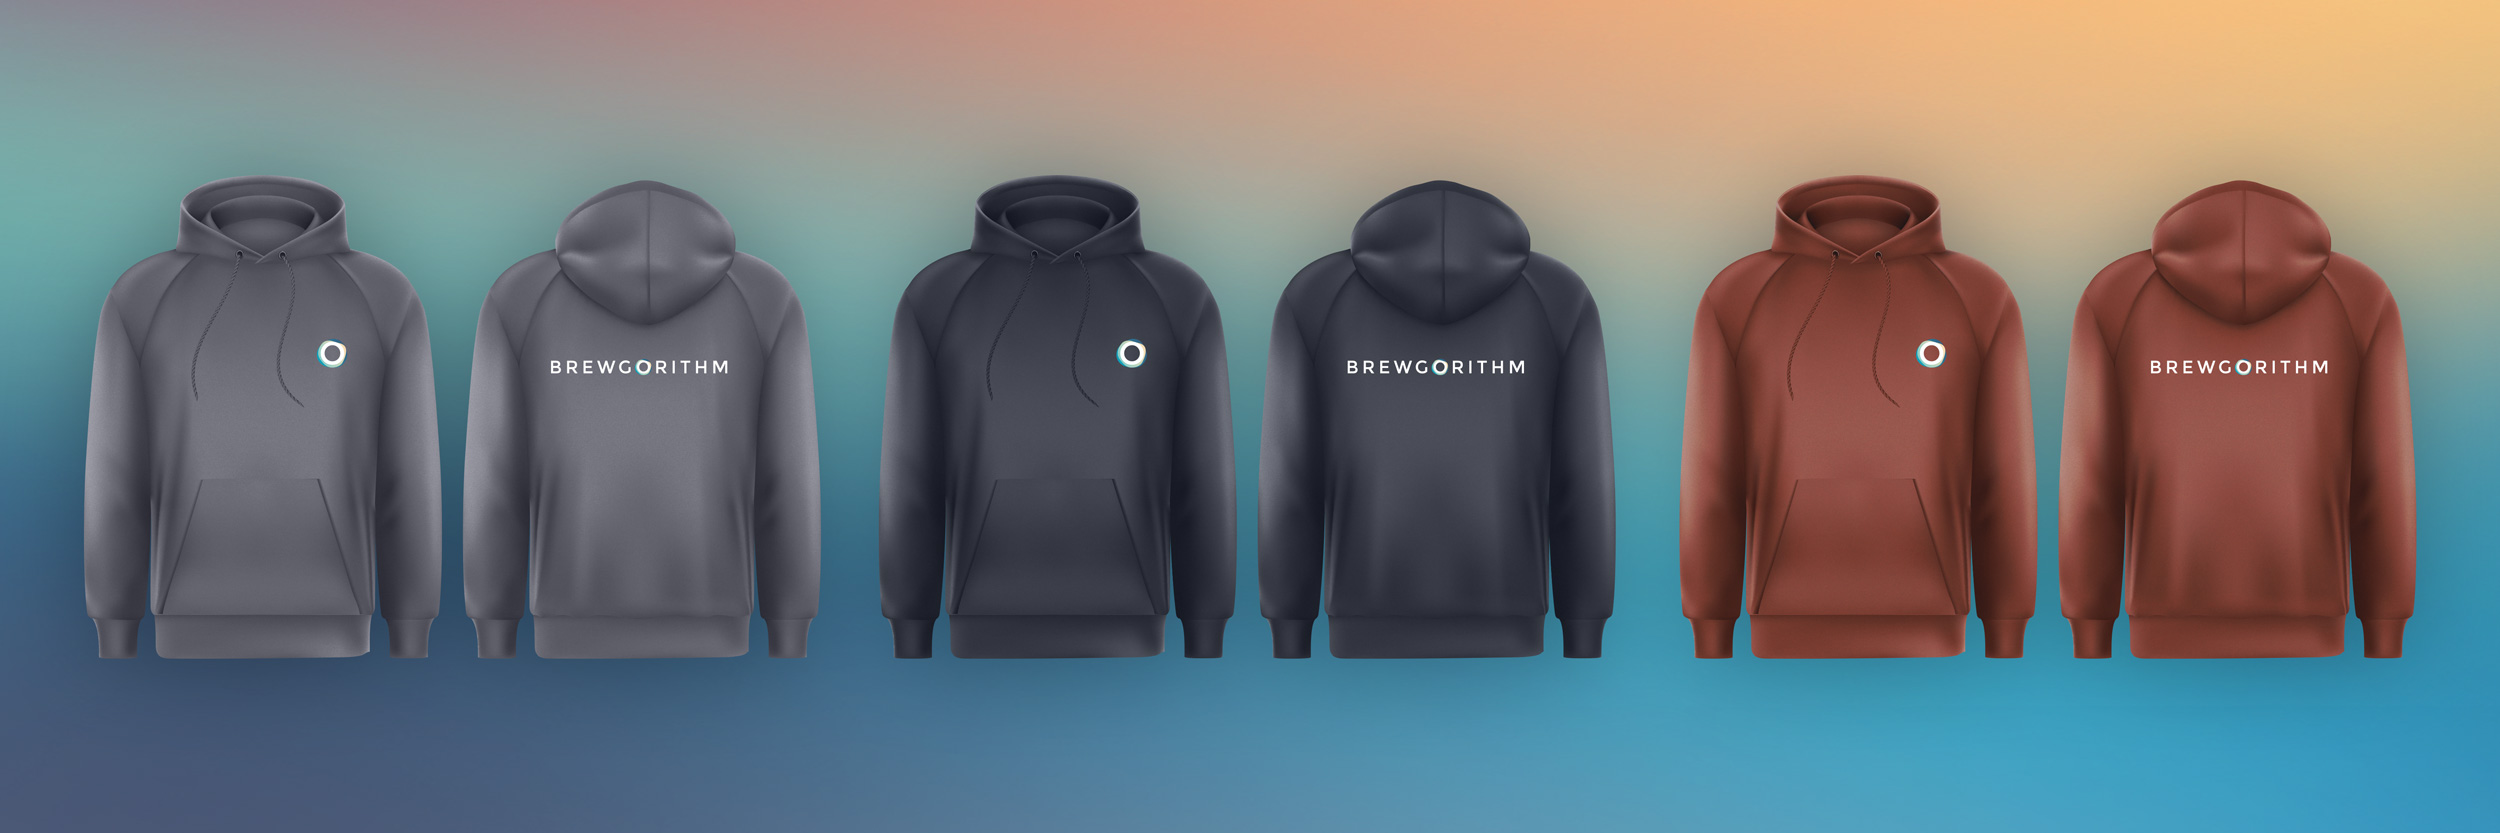 meng-he-brewgorithm-hoodie